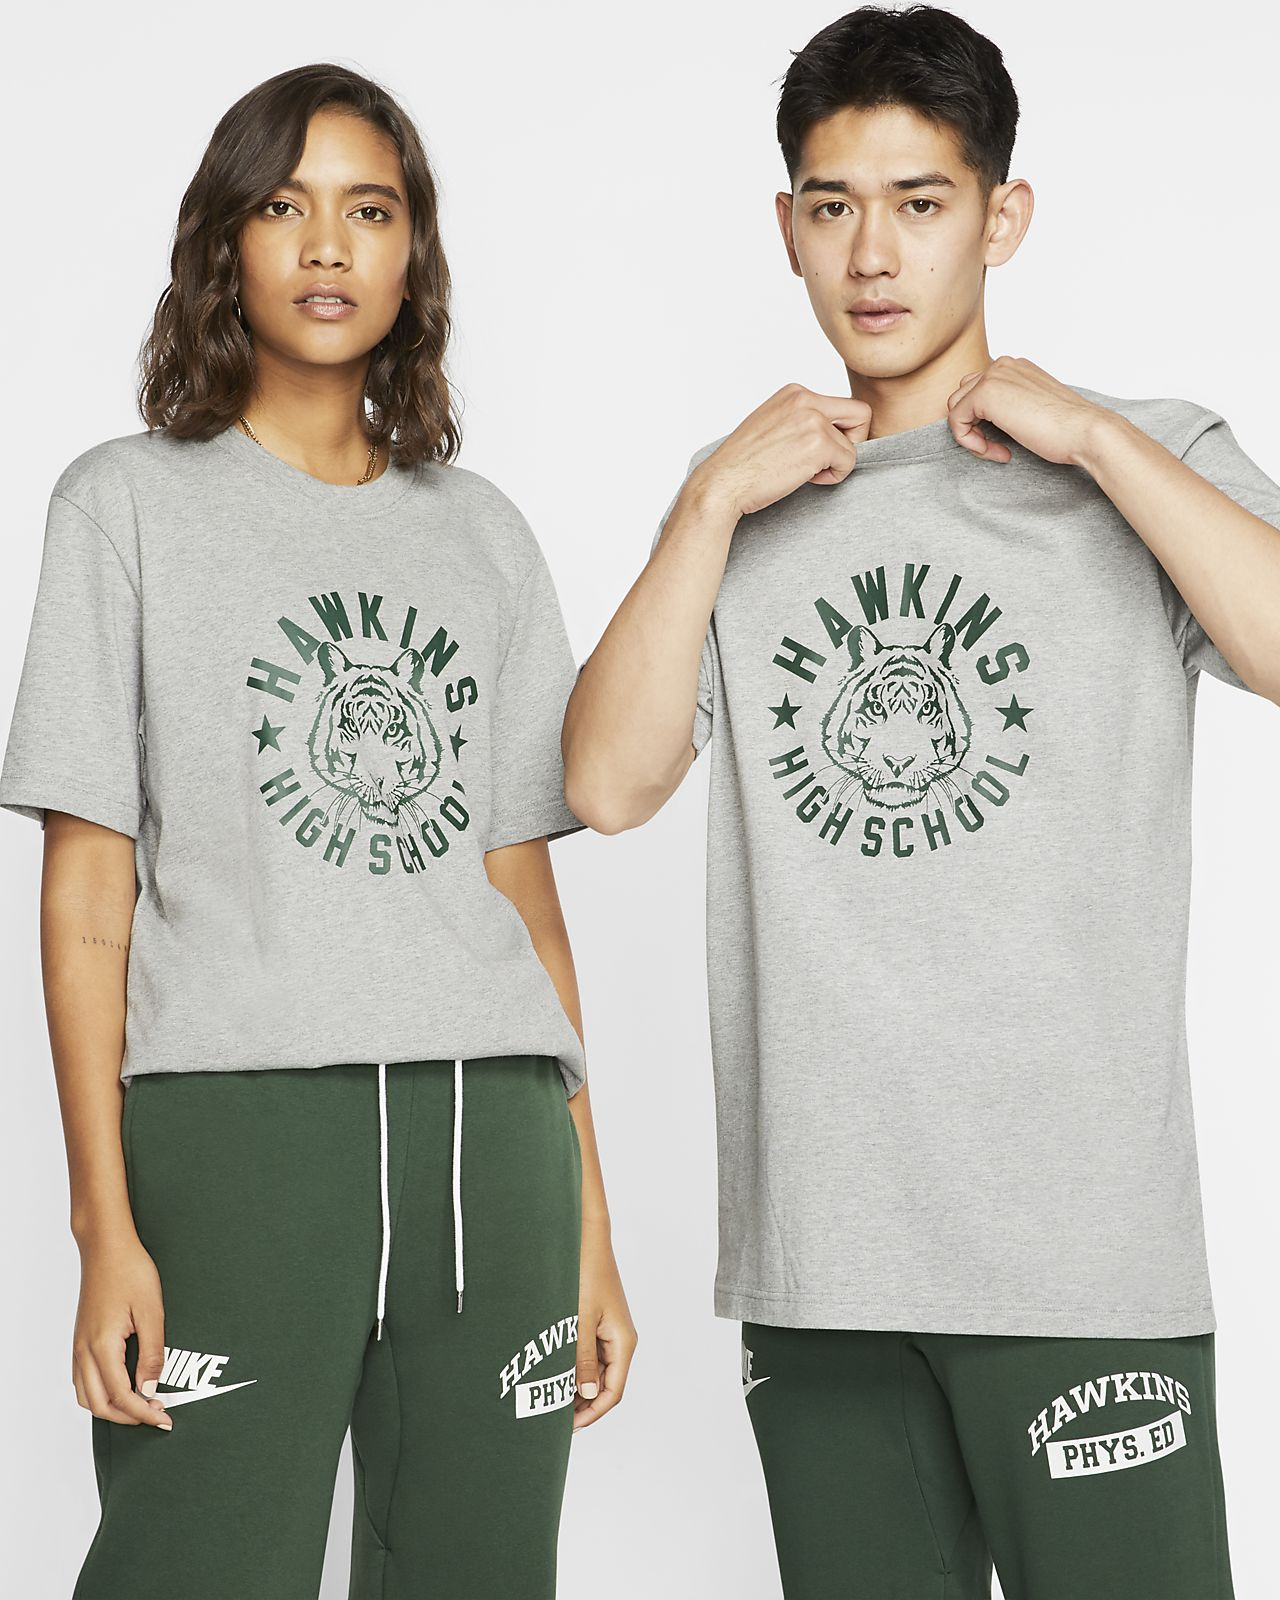 NIKE X HAWKINS HIGH STRANGER THINGS T Shirt